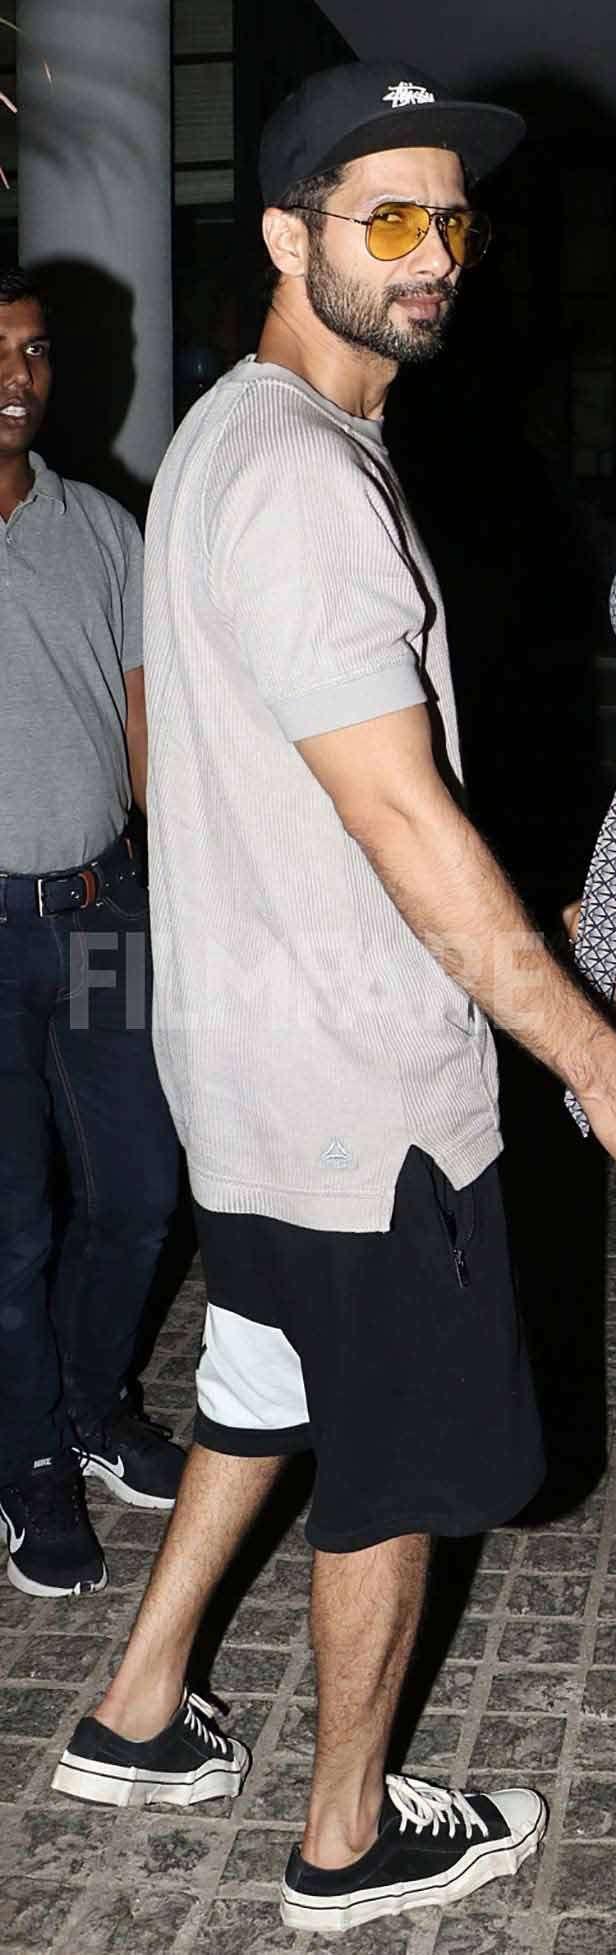 Shahid Kapoor and Mira Kapoor's romantic date night